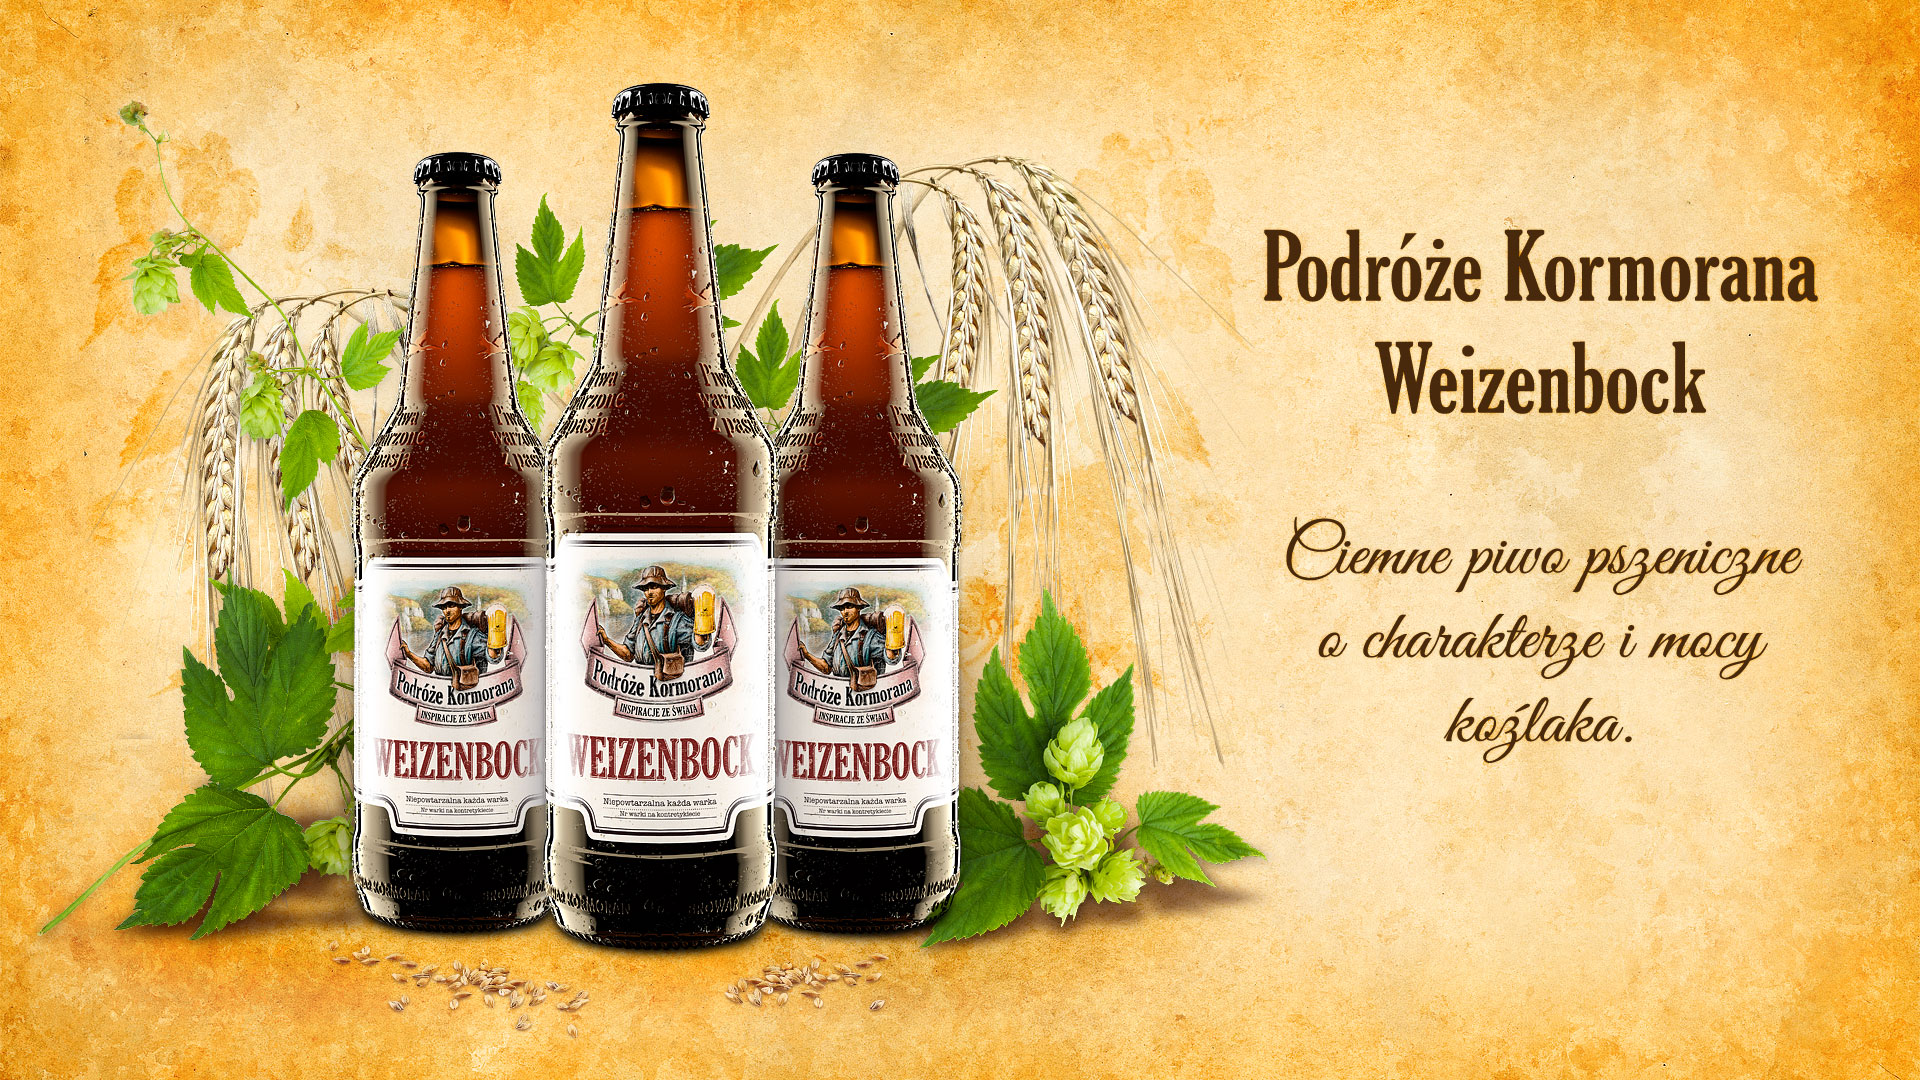 Piwo Podróże Kormorana Weizenbock - Browar Kormoran